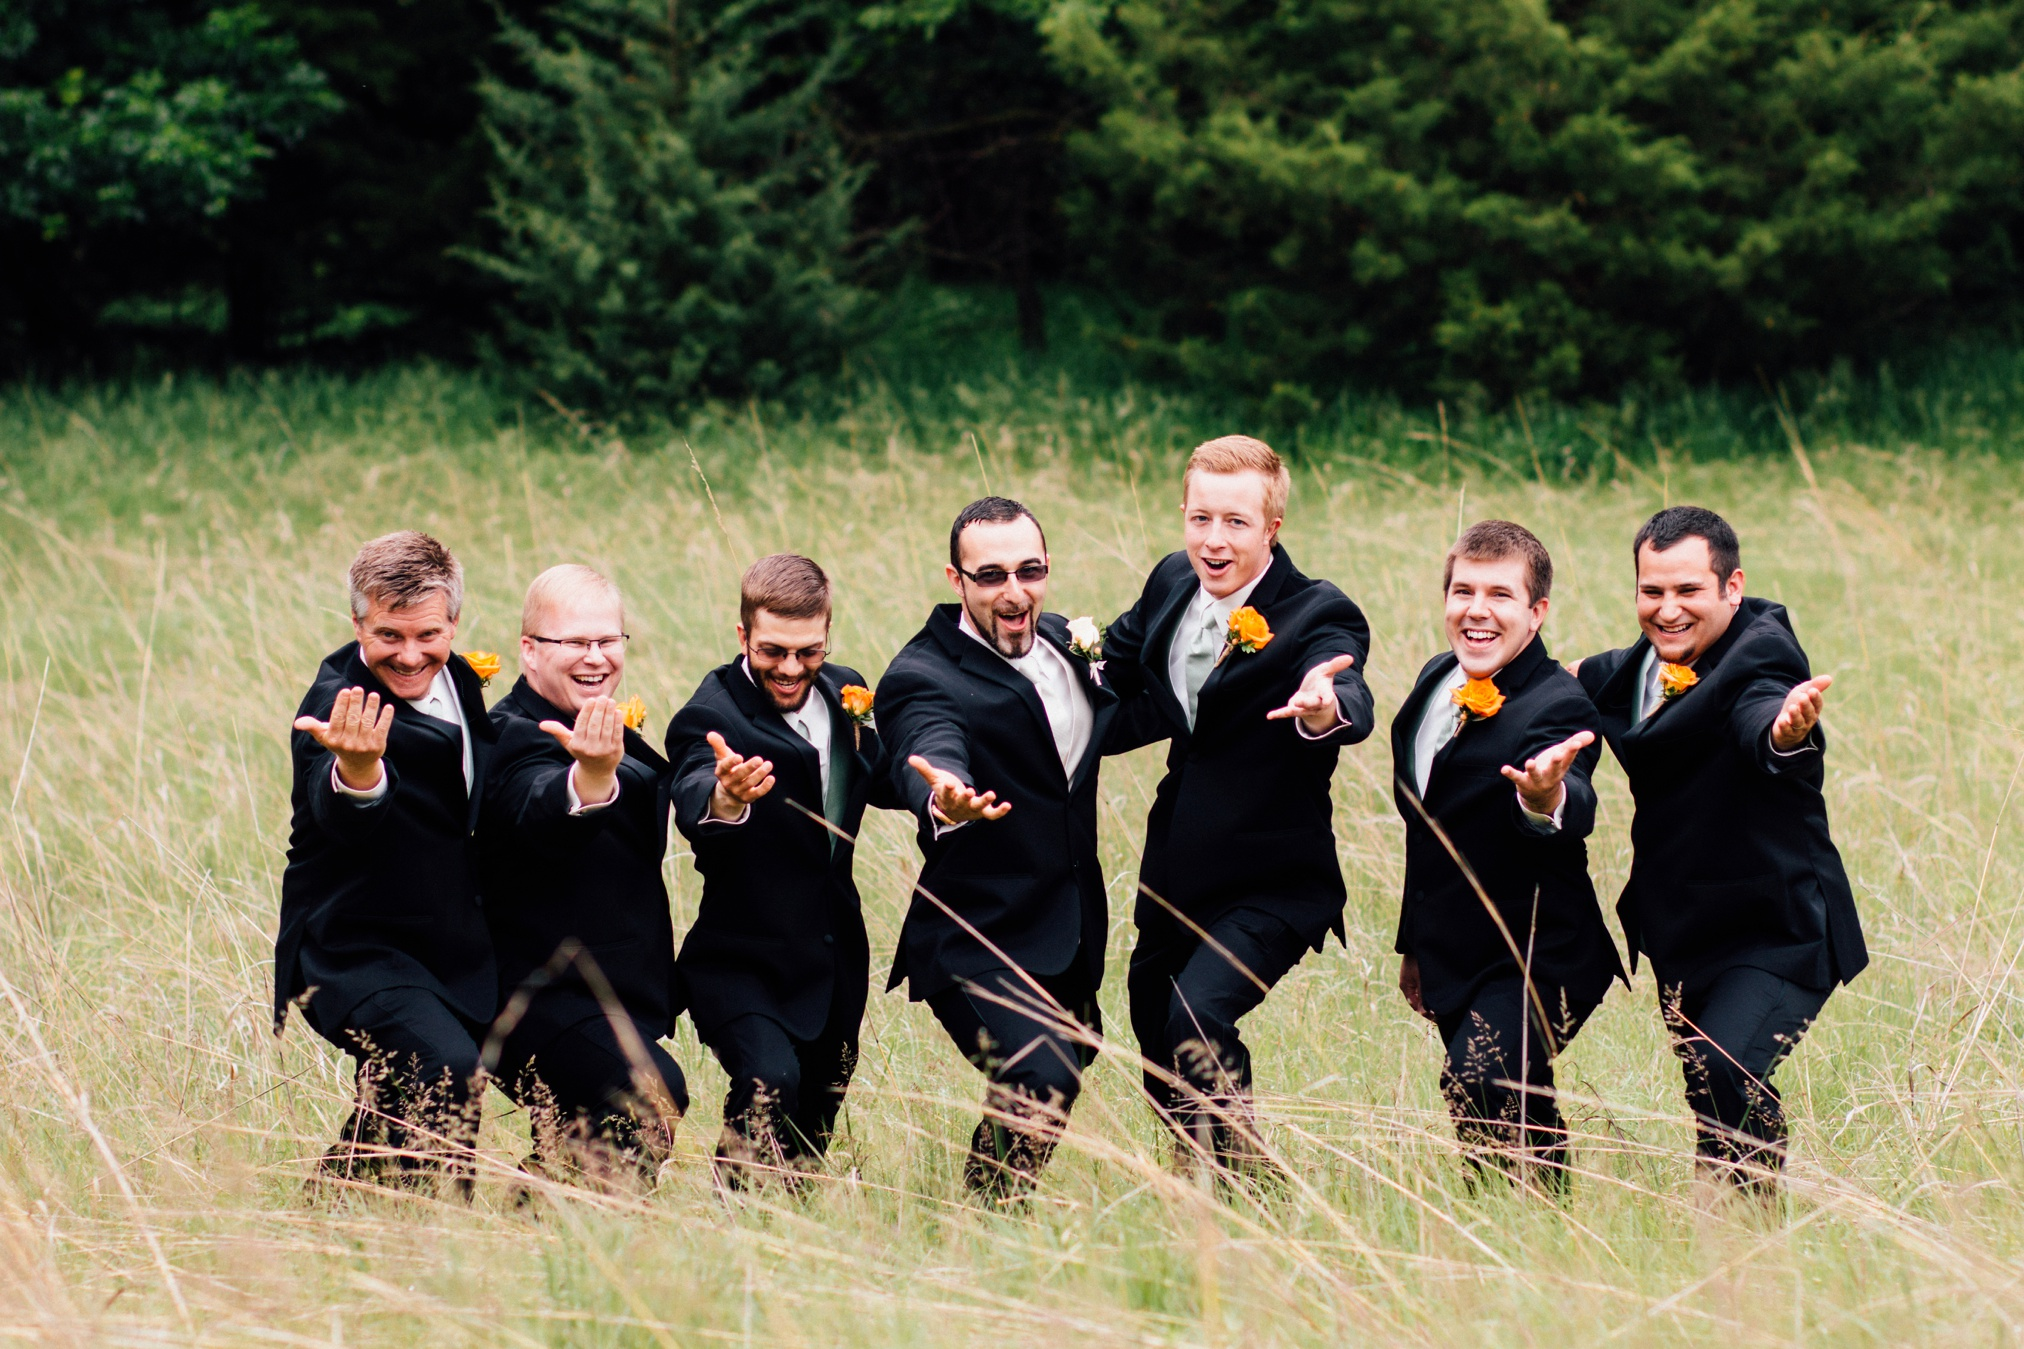 schmid_wedding-226.jpg